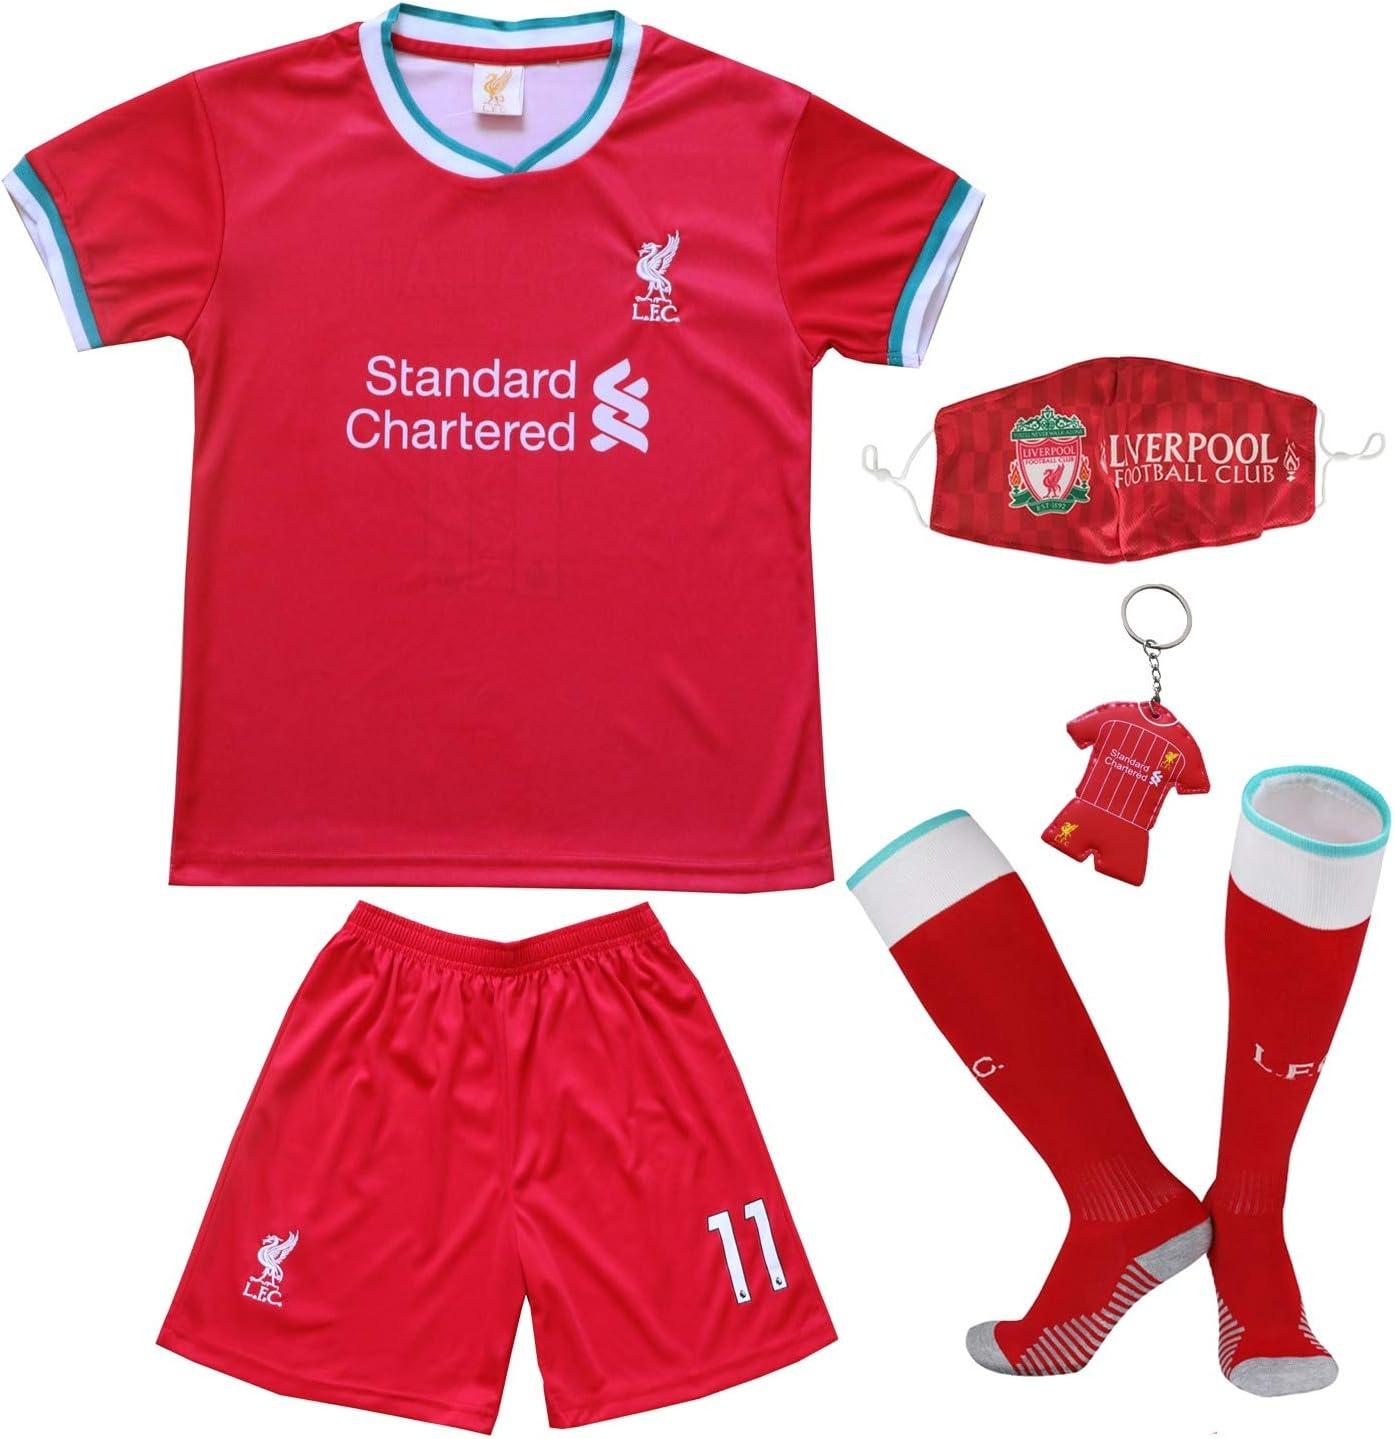 BIRDBOX Youth Sportswear Liverpool Mohamed Salah 11 Kids Home Soccer Jersey/Shorts Bag Keychain Football Socks Set